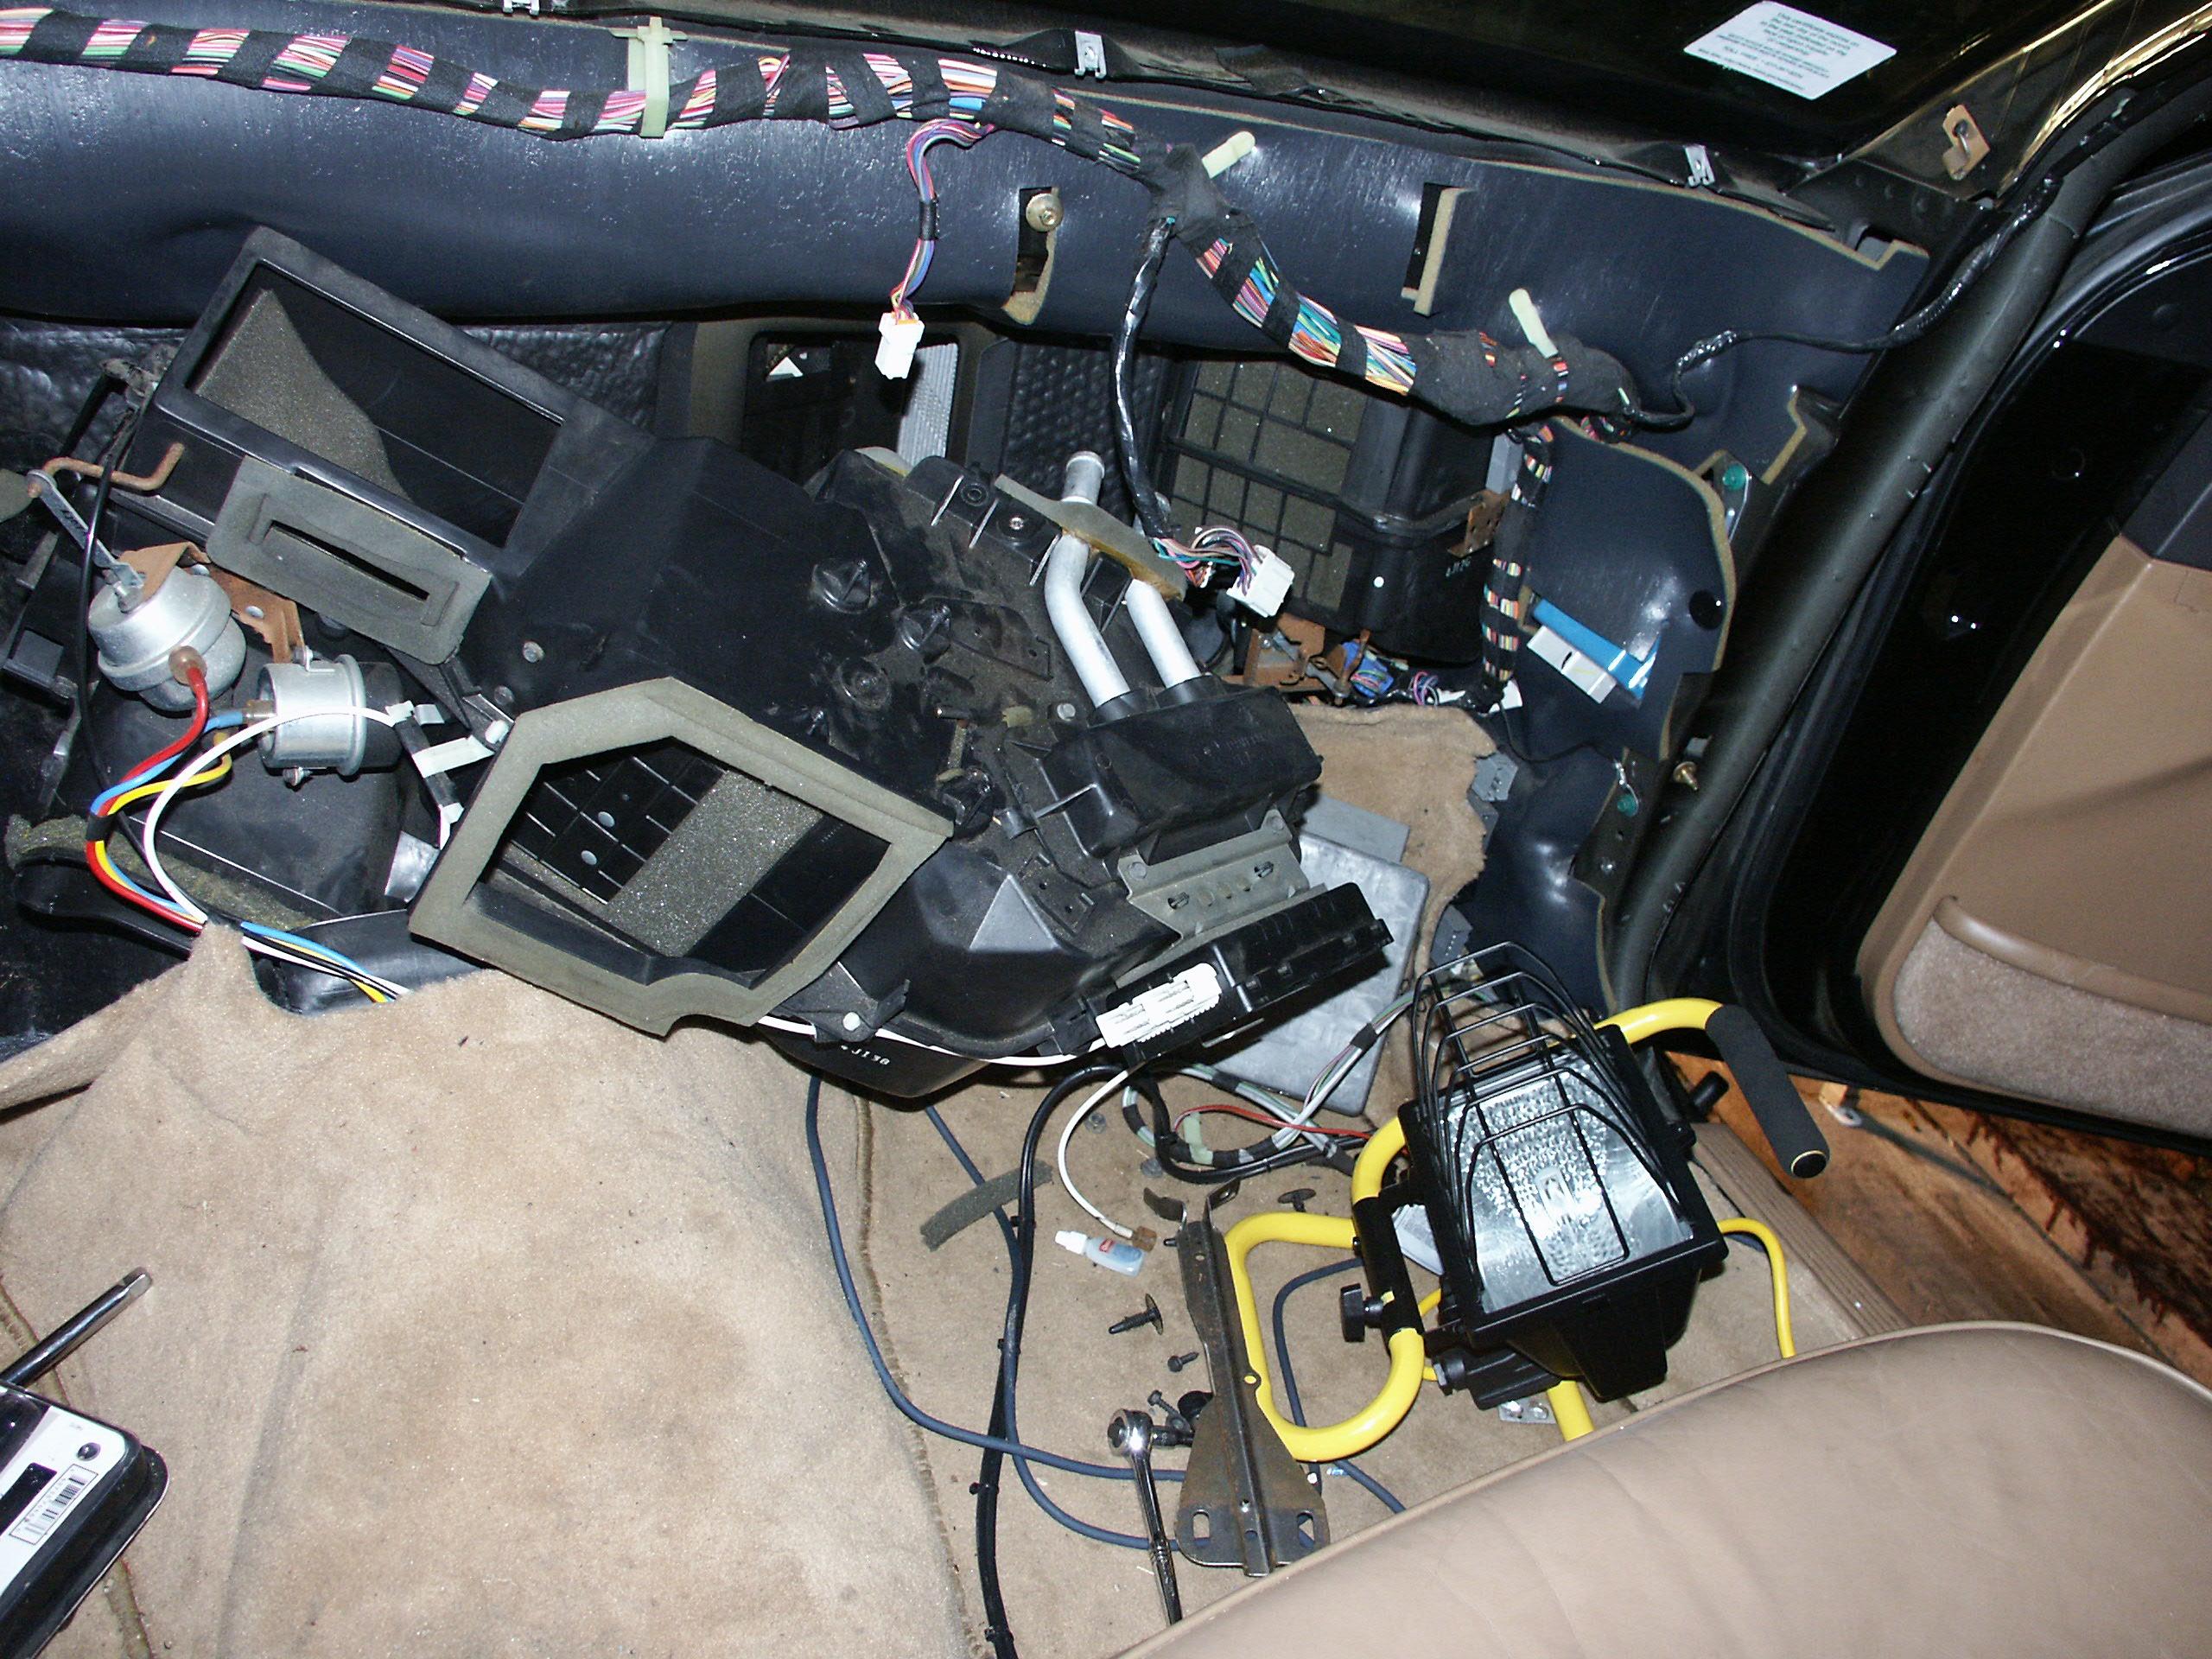 2003 Mercury Marquis Blower Wiring - 2014 Volkswagen Cc Fuse Box Diagram -  srd04actuator.sampwire.jeanjaures37.fr | 2003 Mercury Grand Marquis Blower Motor Wiring |  | Wiring Diagram Resource